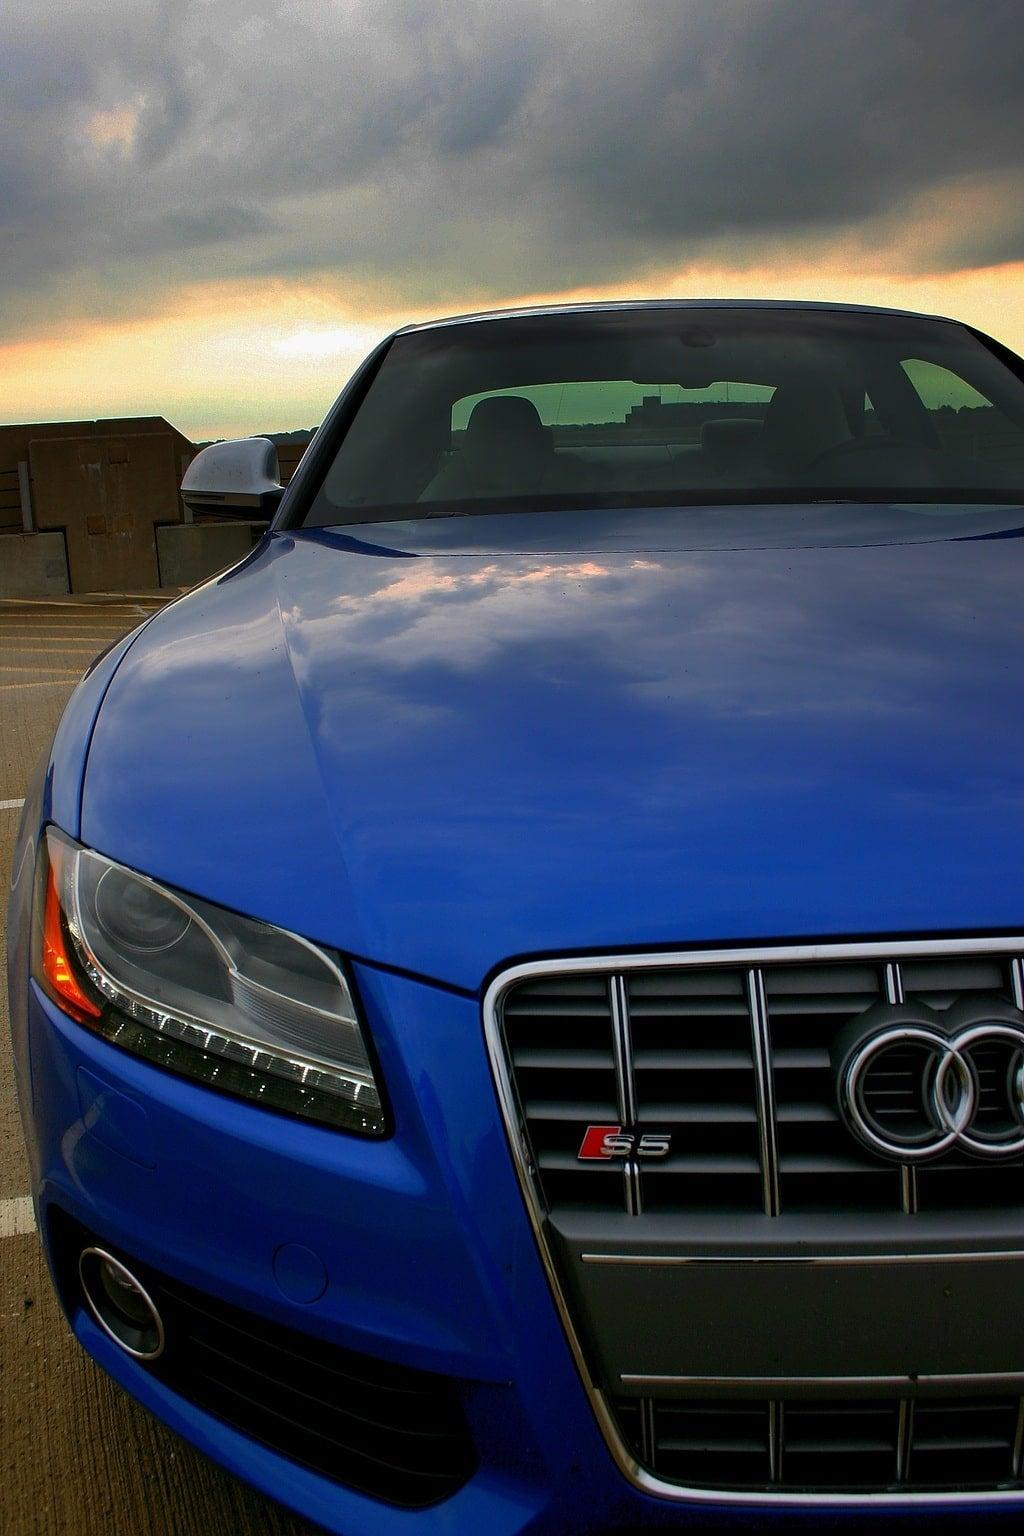 2009 Audi S5 side front